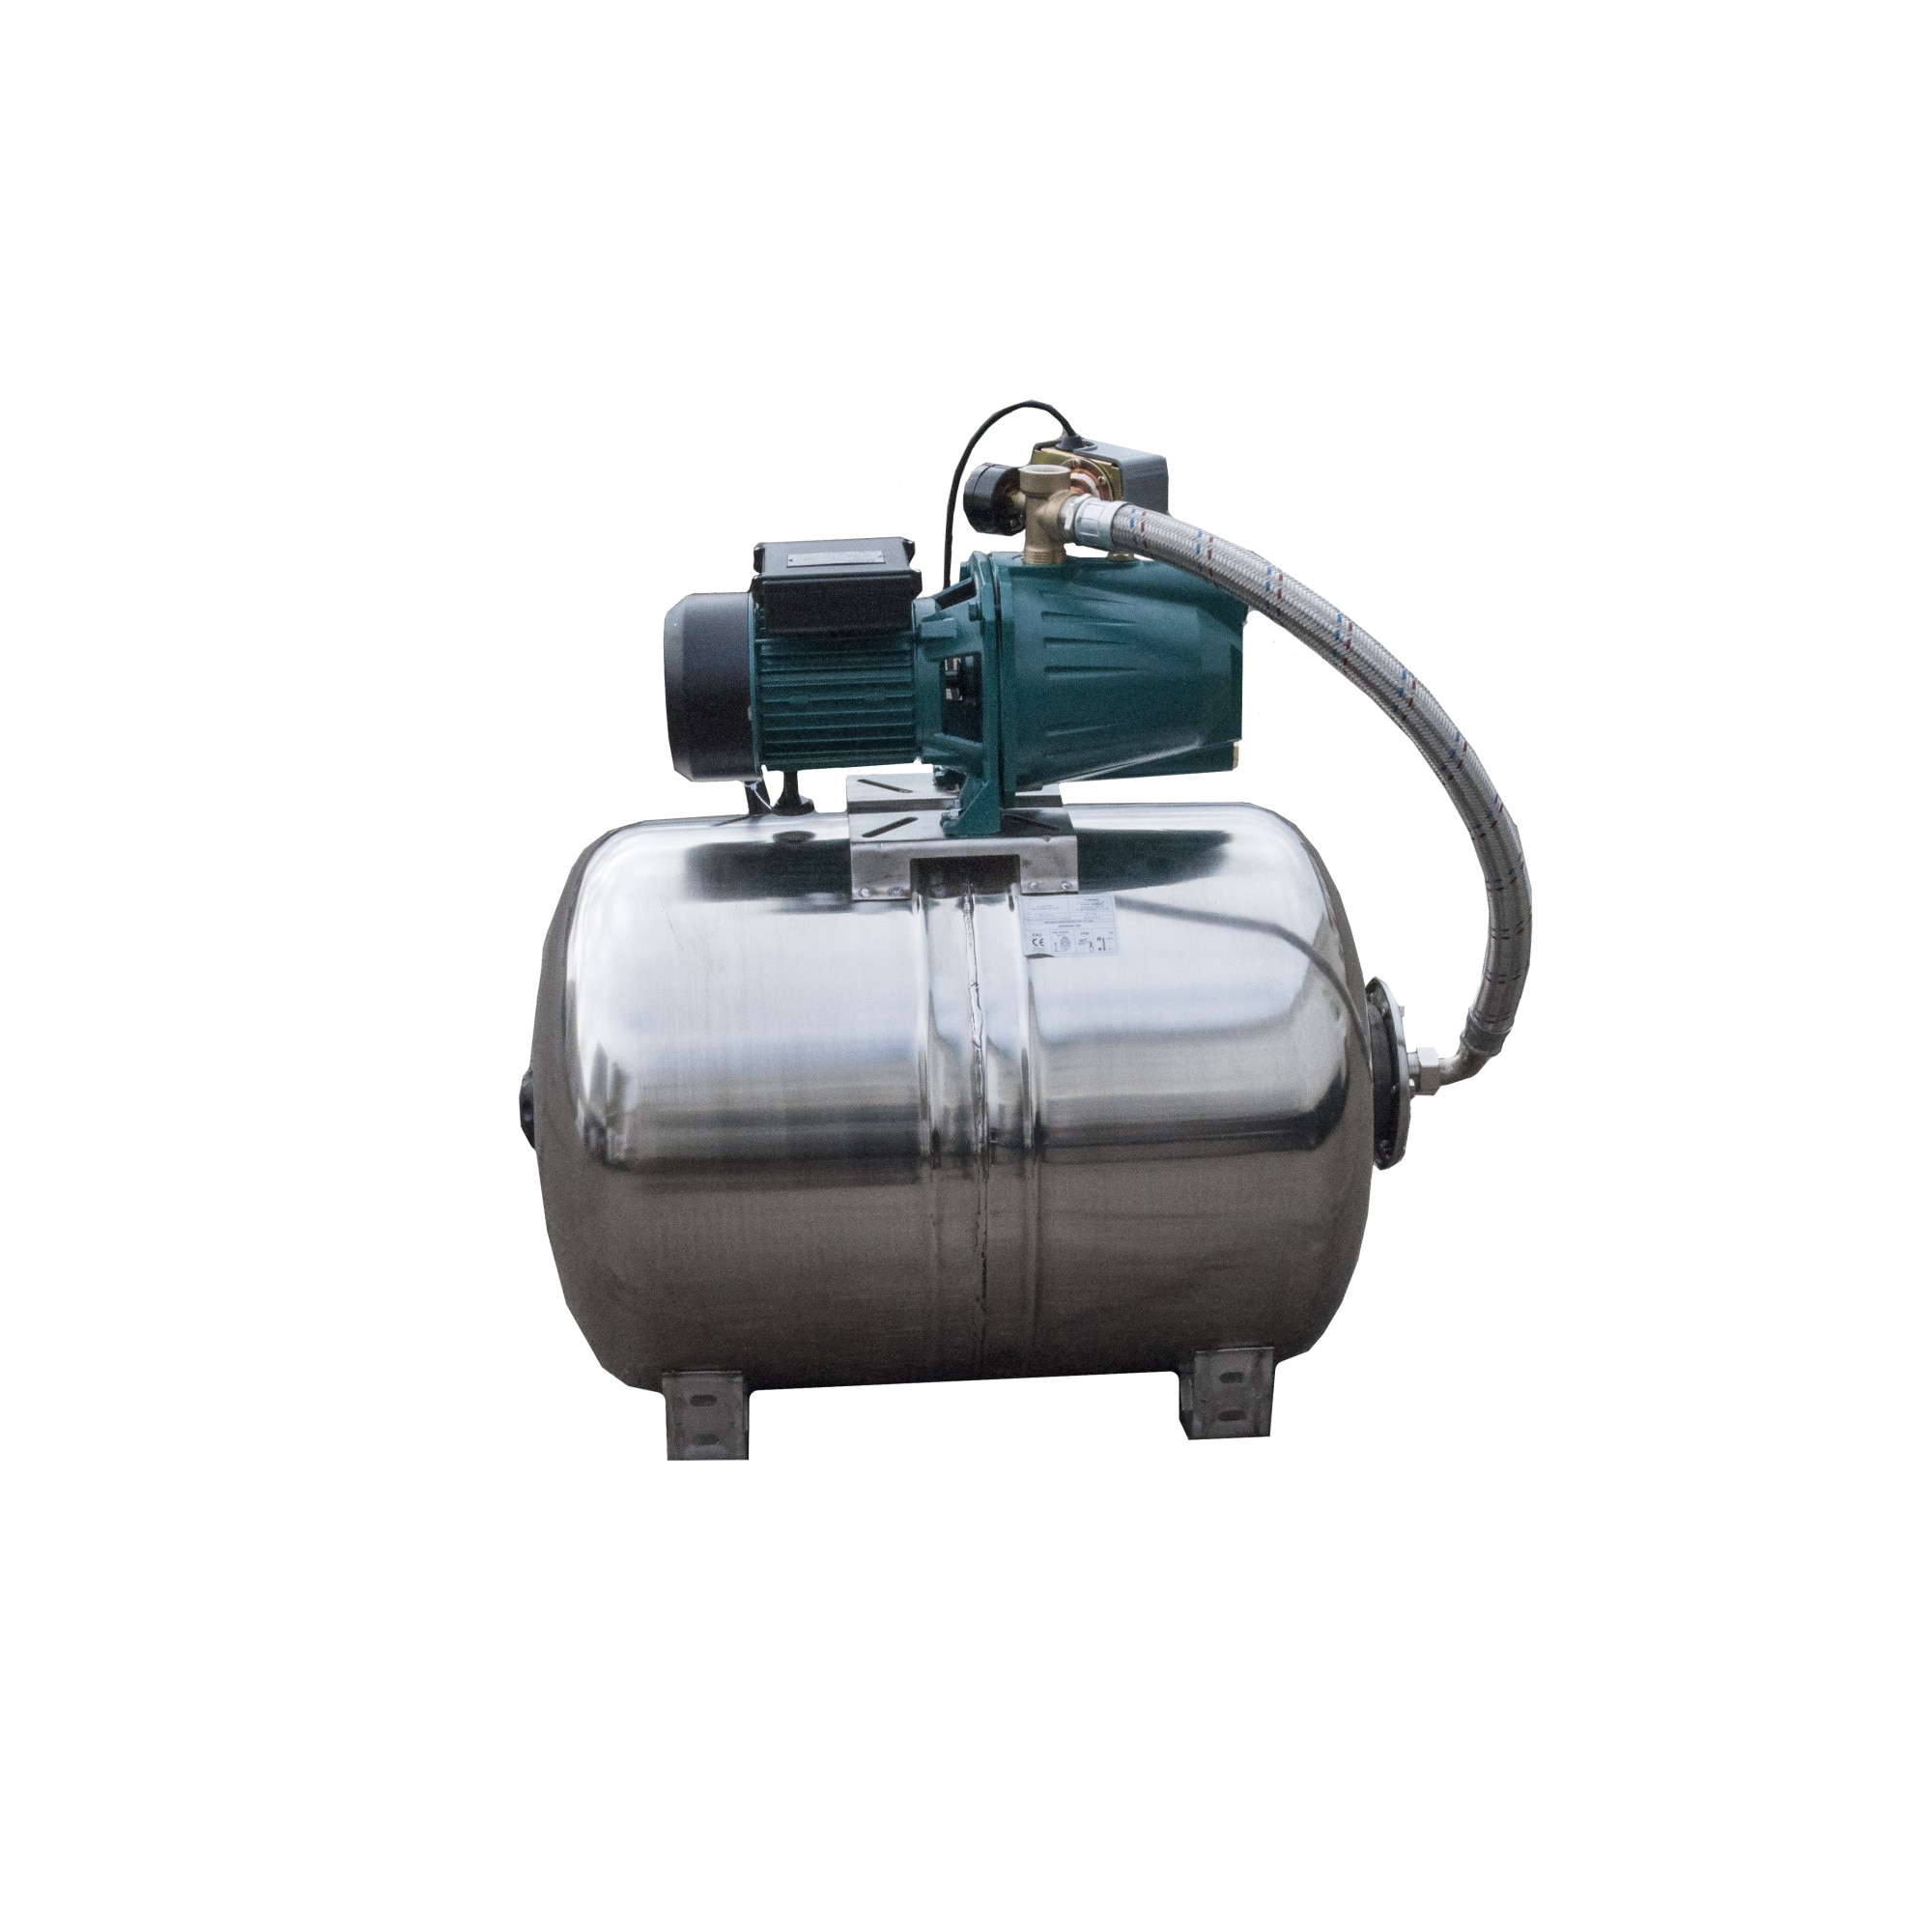 "Fotografie Hidrofor apa curata APC 3020121/100I, 1500 W, 220 V, 100 l capacitate vas expansiune, 1"" diametru racord, 75 l/min debit maxim, 52 m inaltime refulare, 9 m adancime absorbtie"